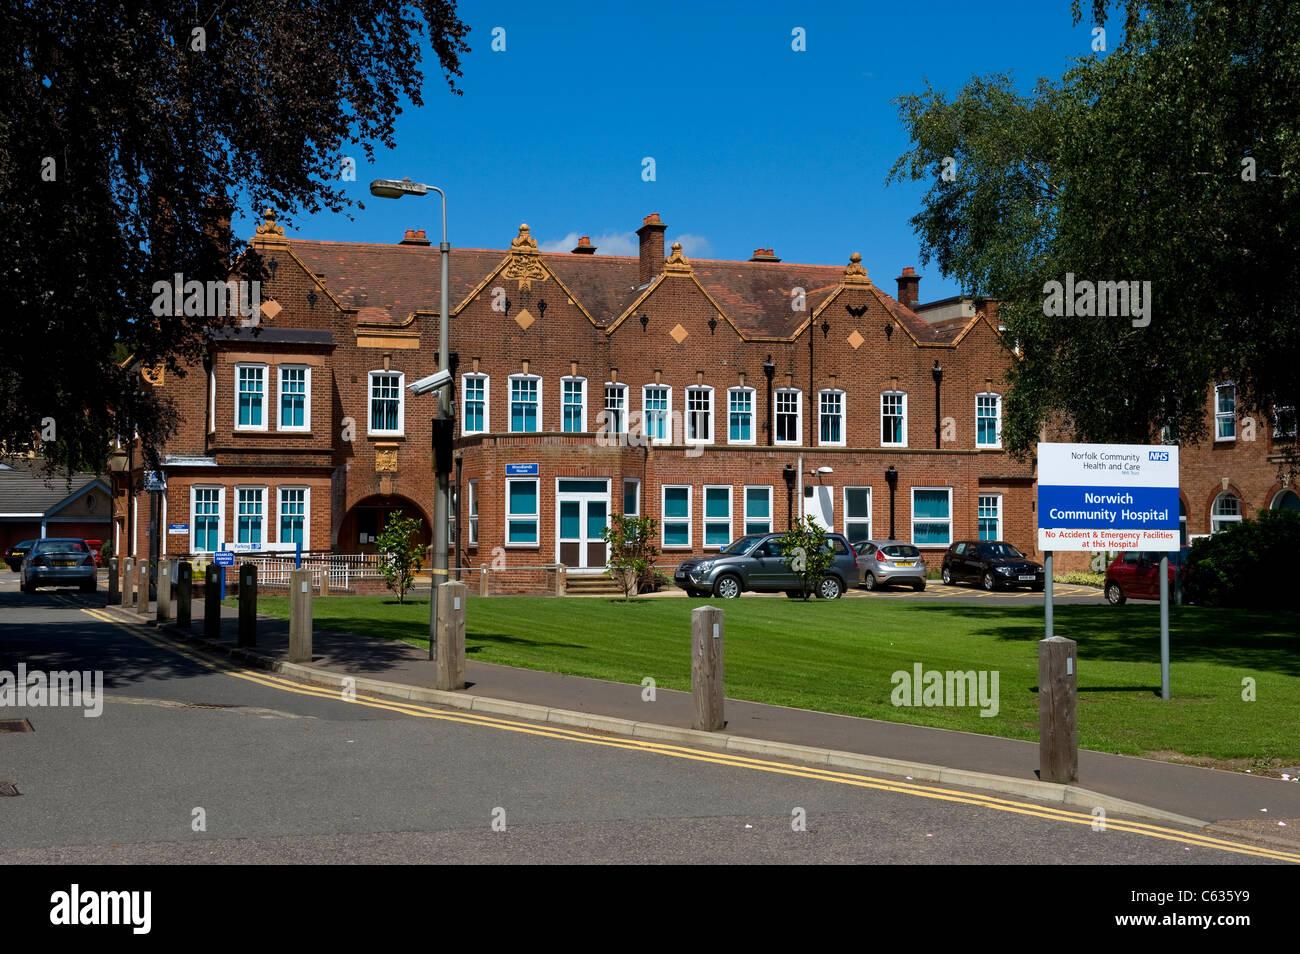 Norwich Community Hospital, Norwich, Norfolk, UK - Stock Image